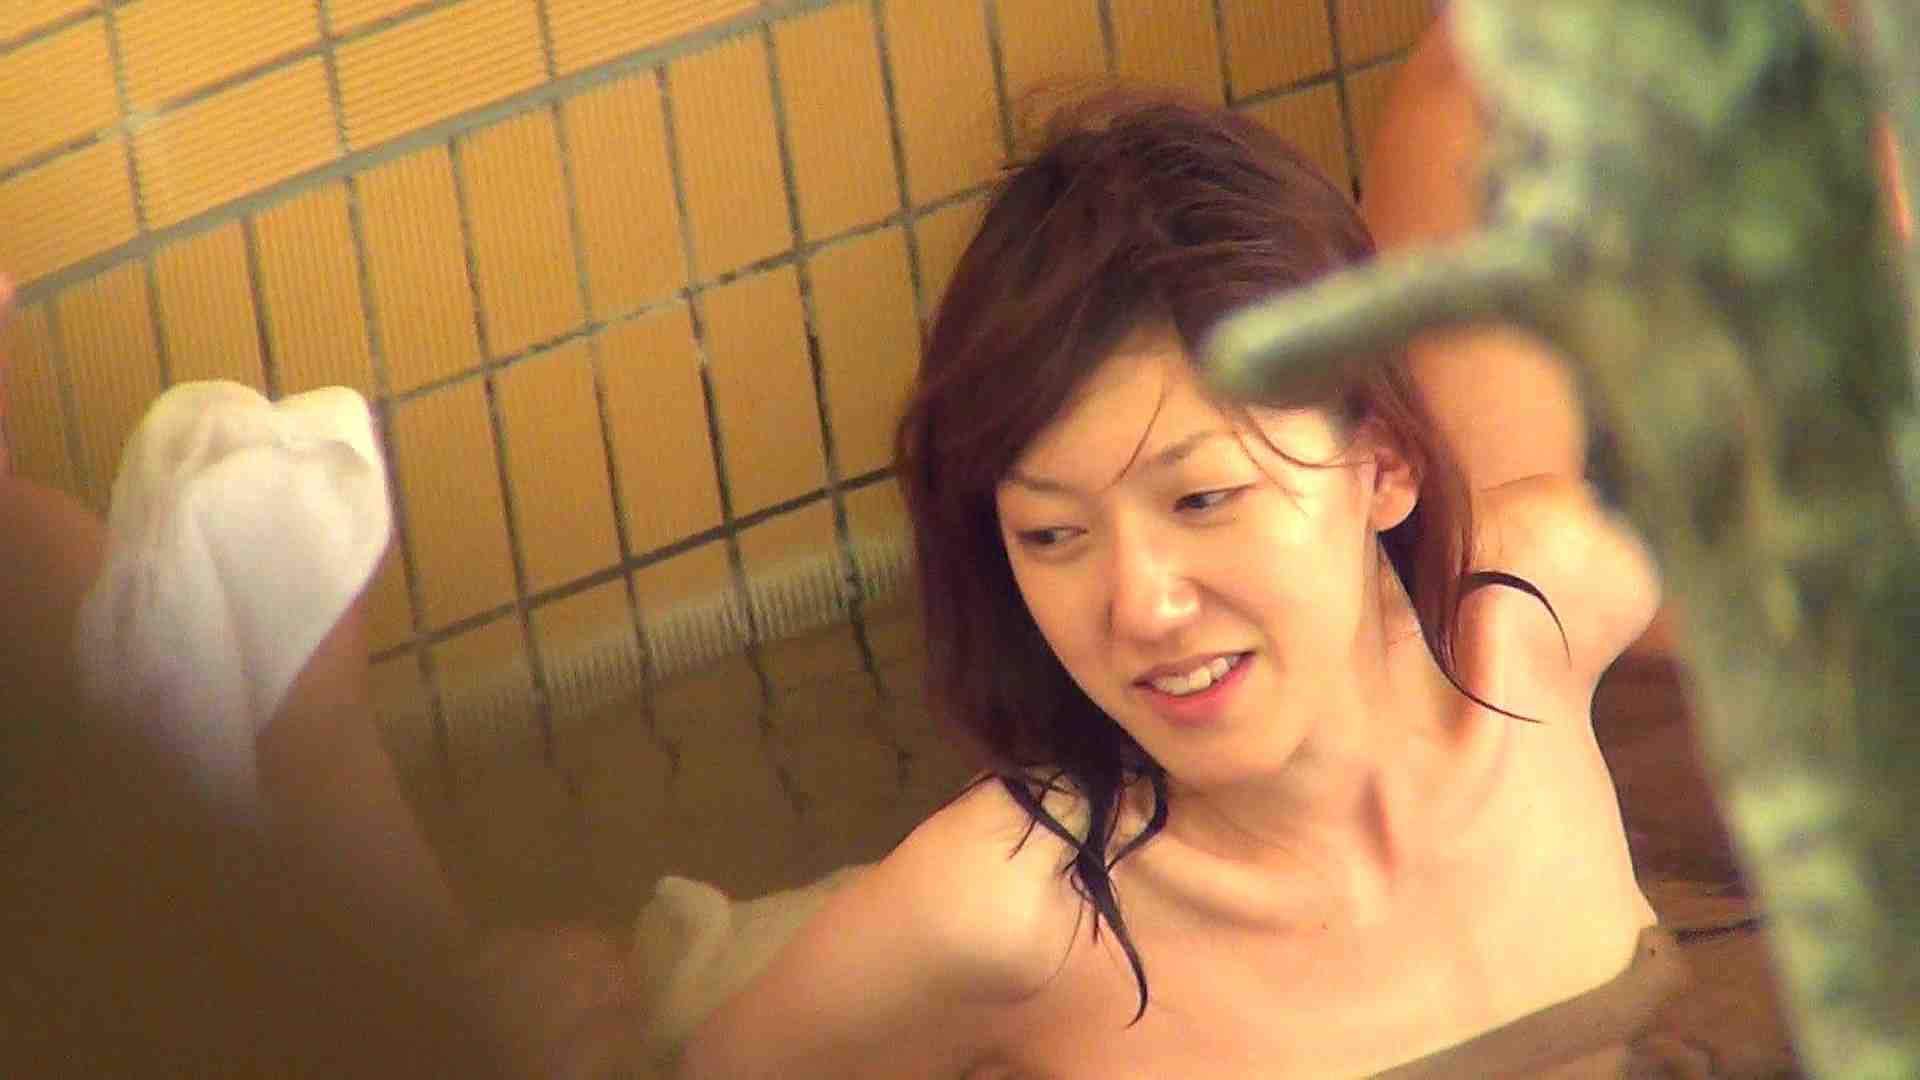 Aquaな露天風呂Vol.277 露天  75連発 71